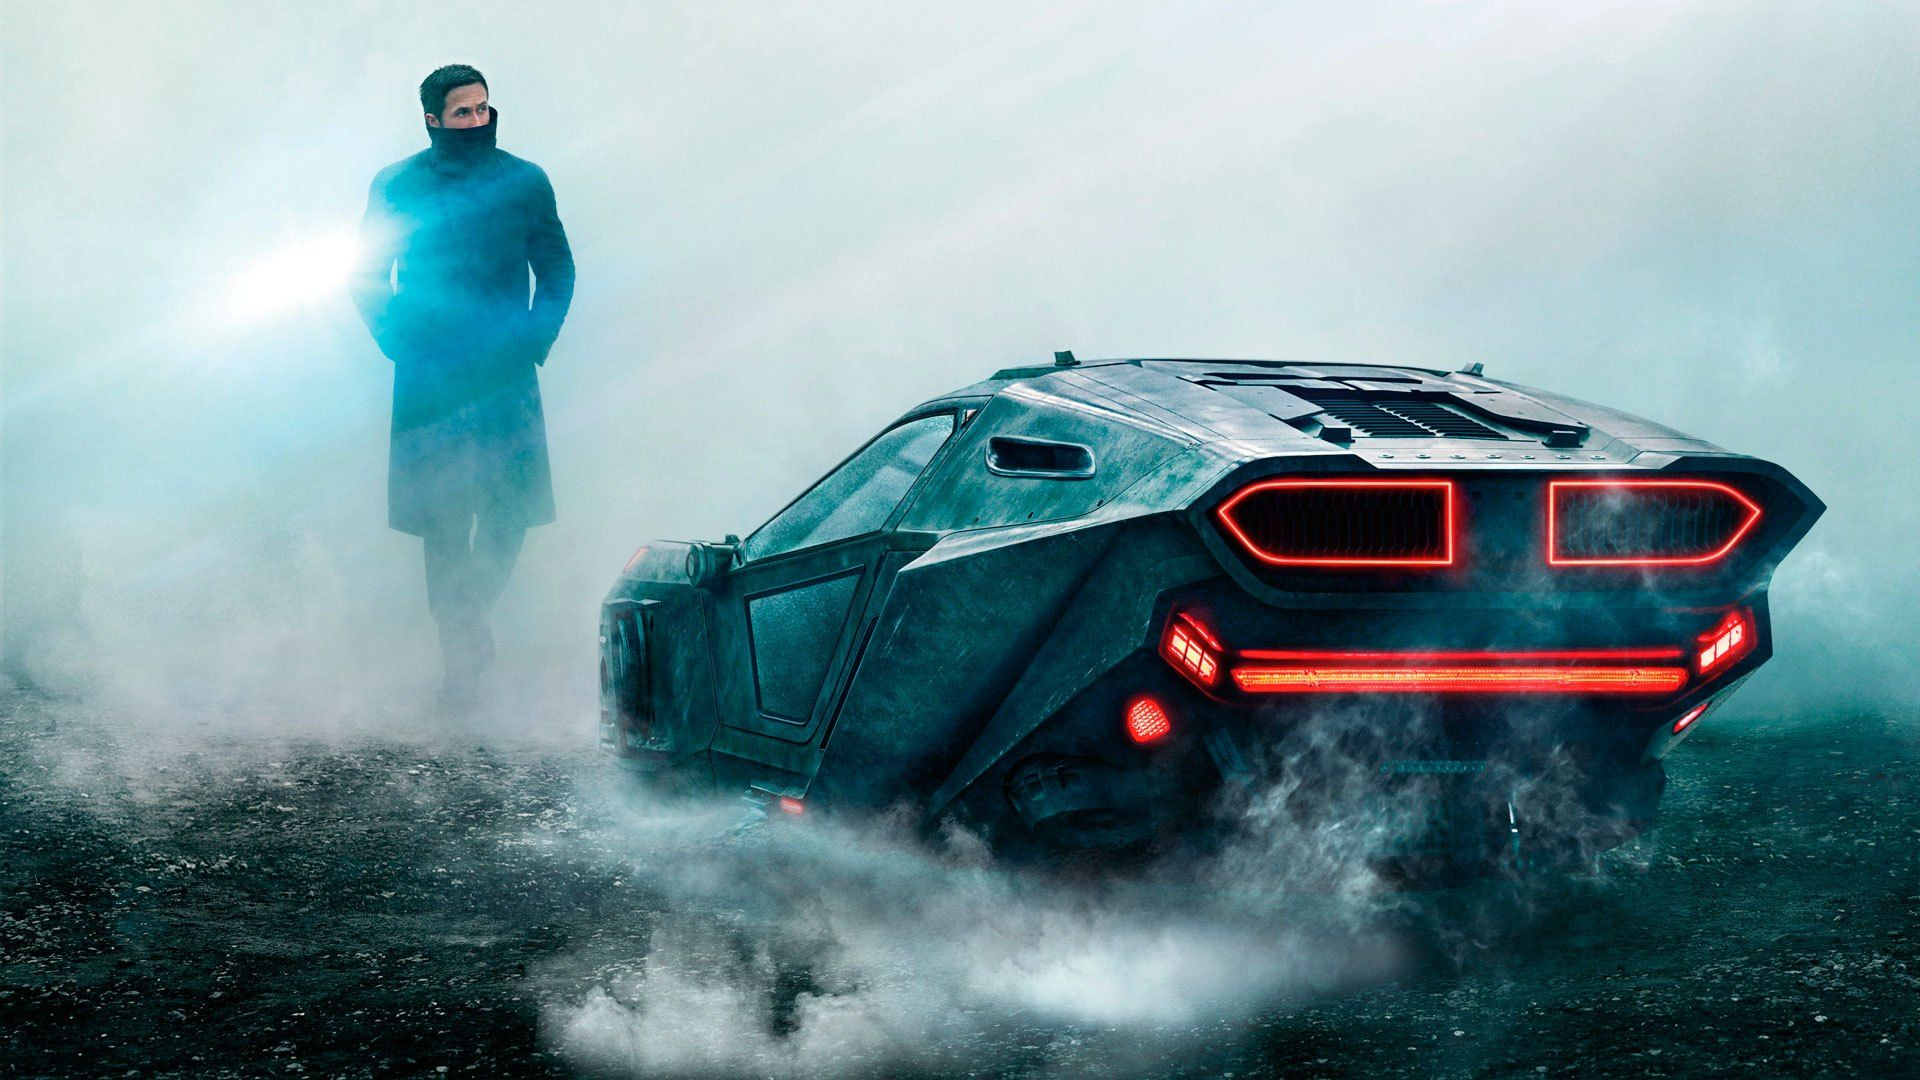 Blade Runner 2049 Hd Blade Runner Car Blade Runner 2049